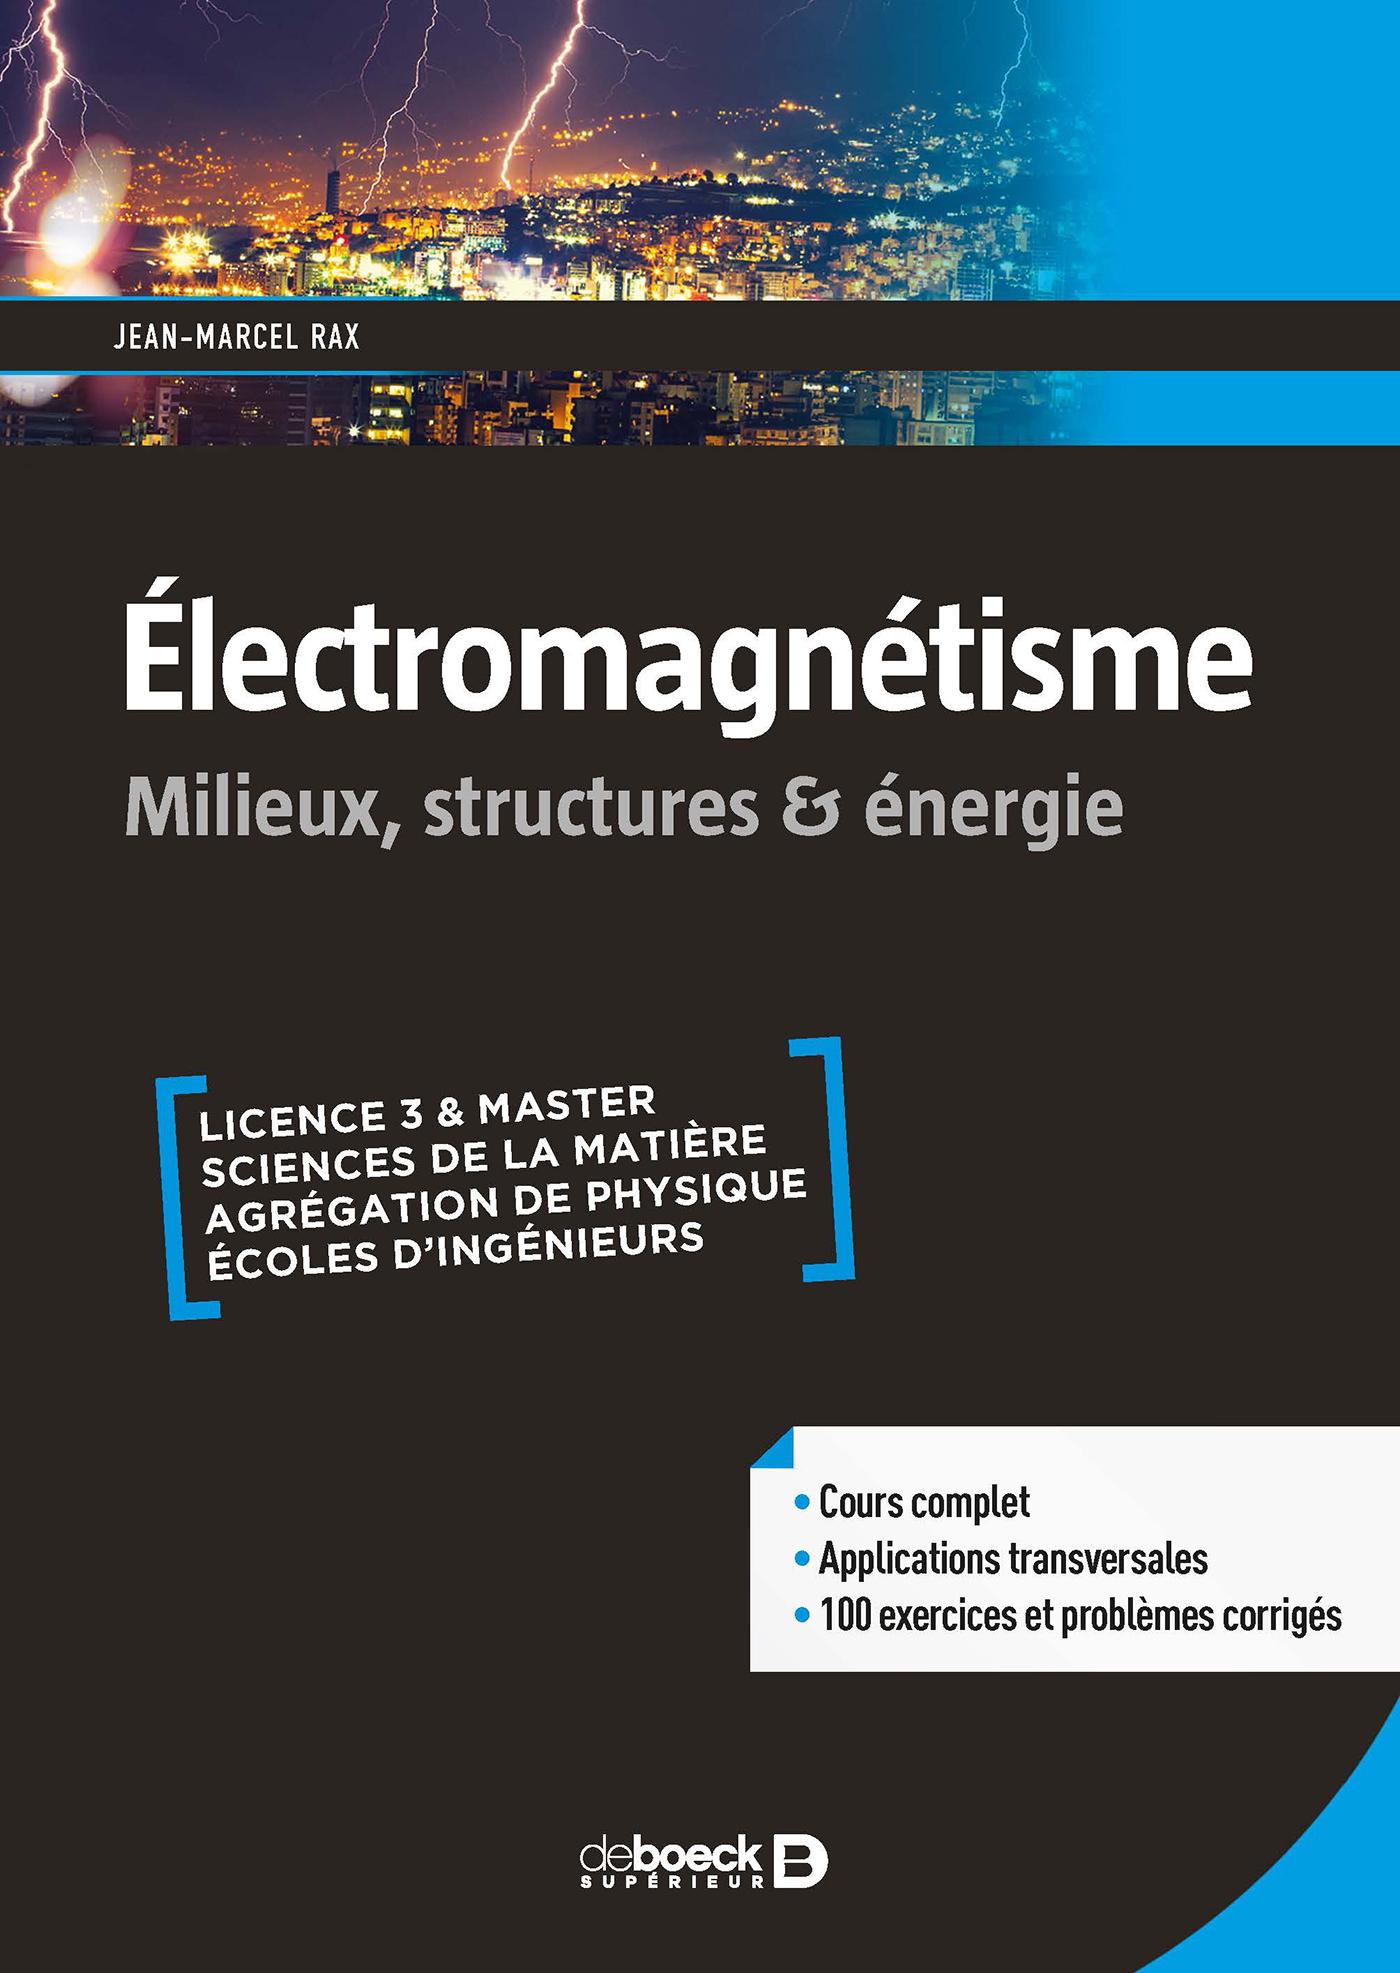 ELECTROMAGNETISME